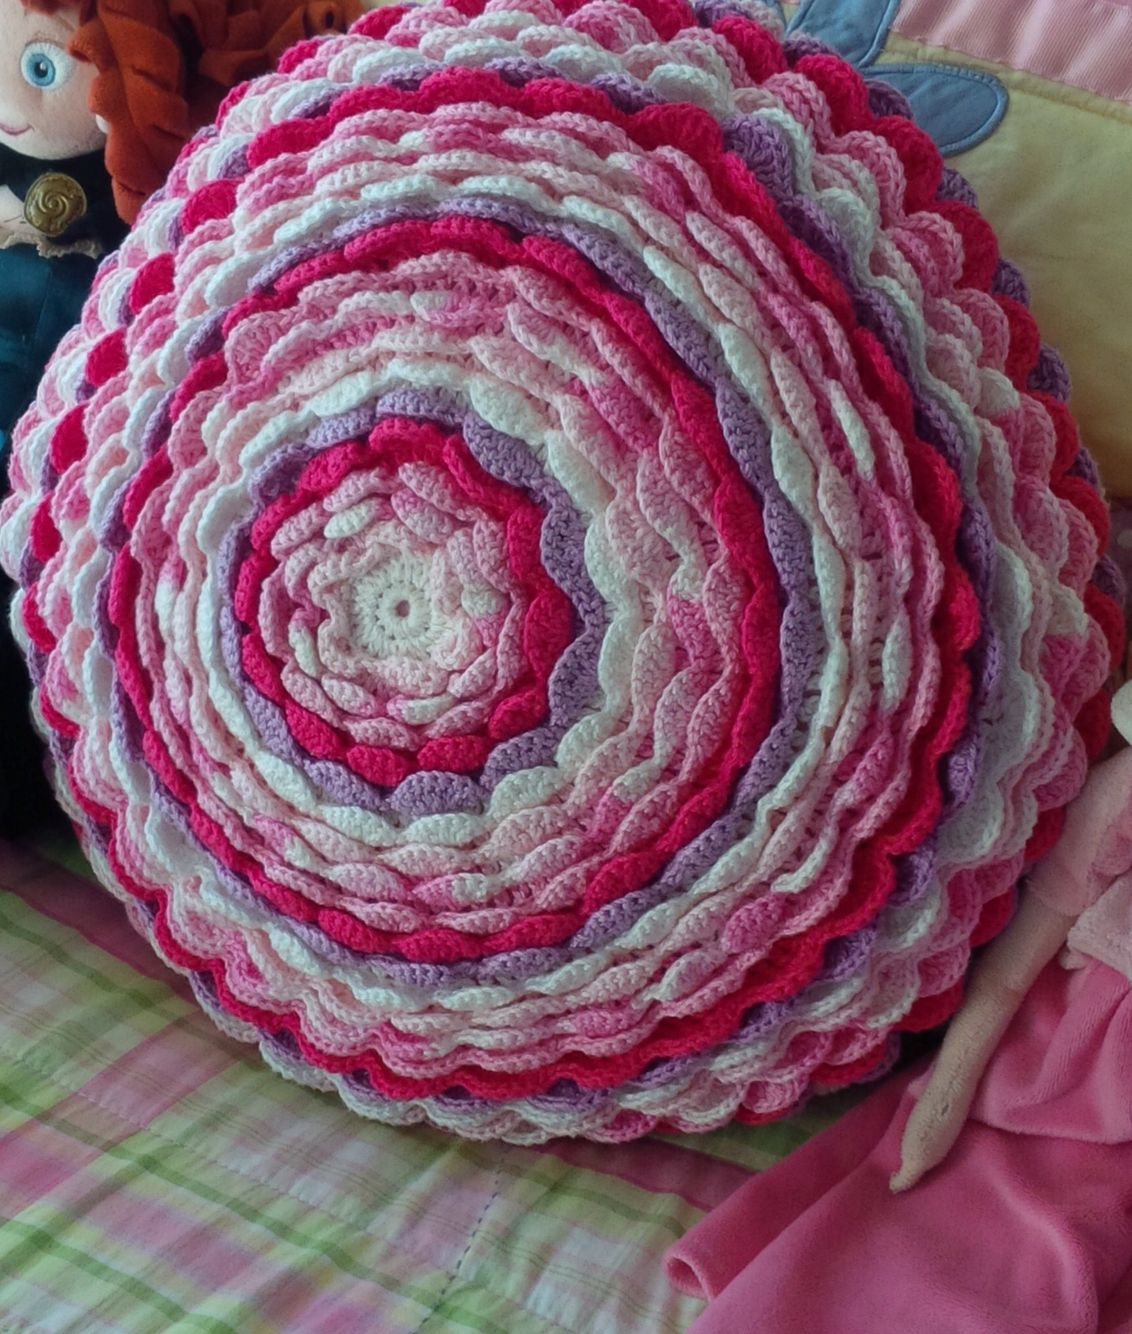 Crochet flor almohada cojin flower pillow | Crochet - tığ işi ...